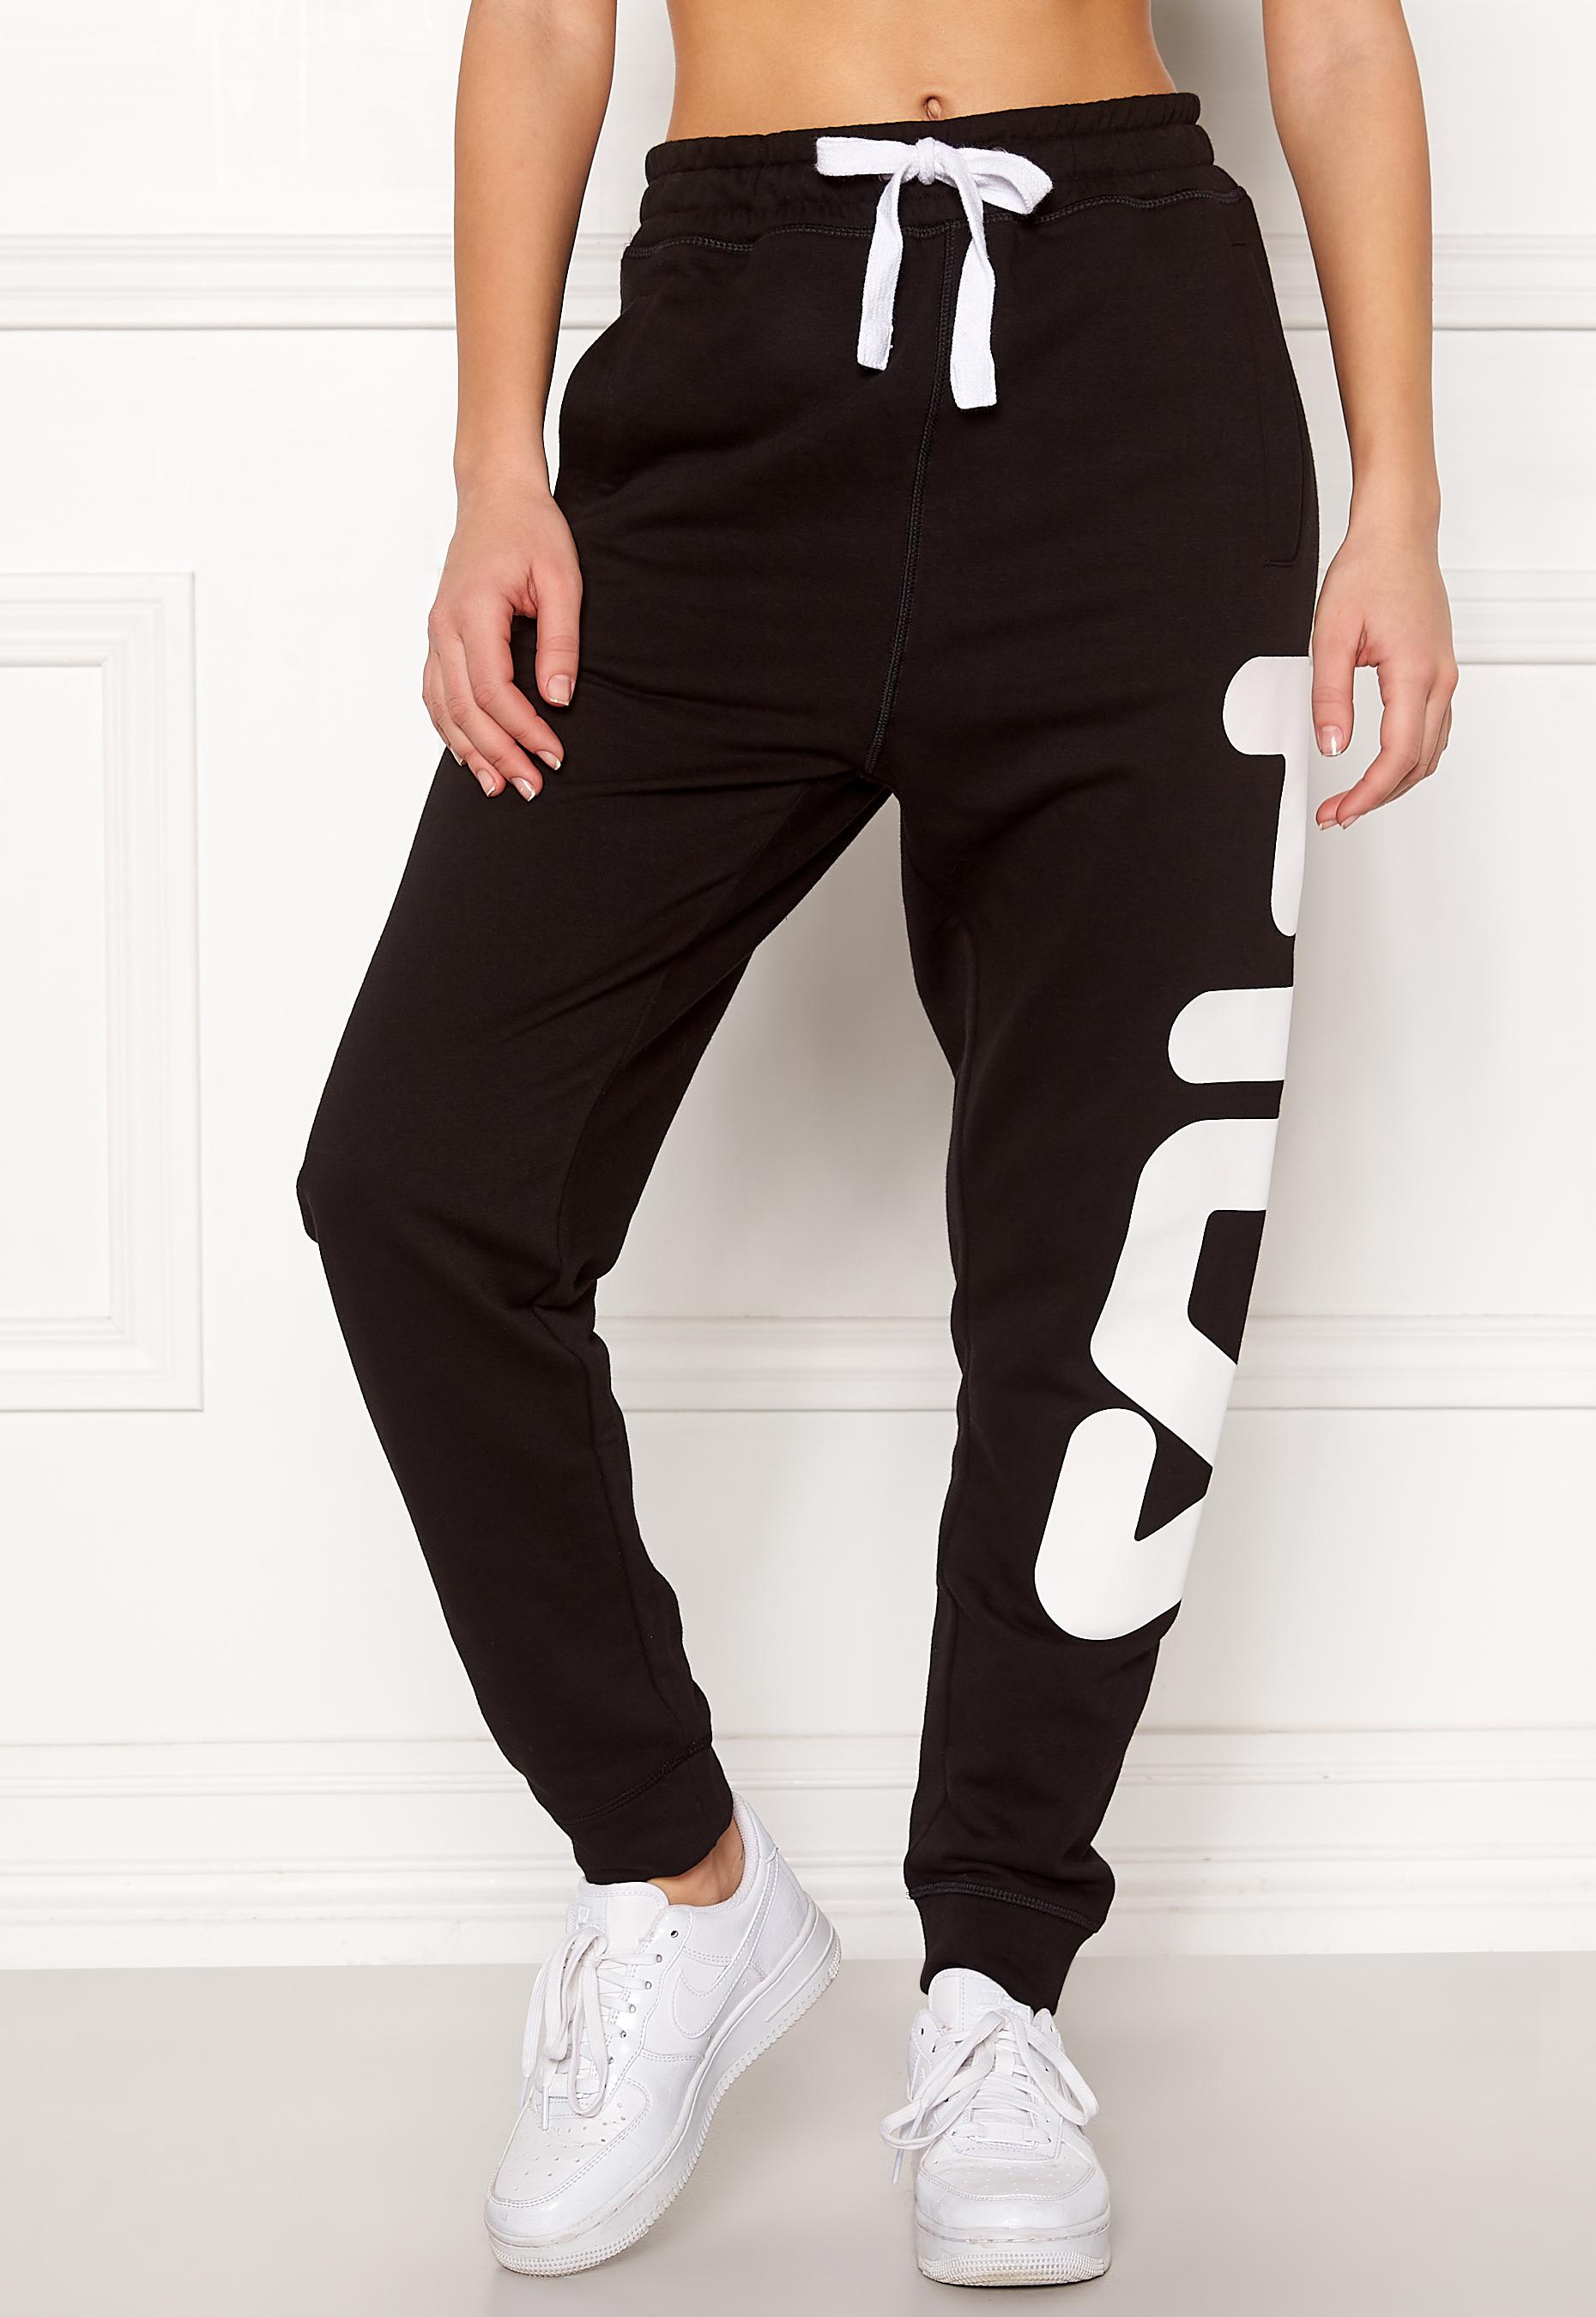 ad678bbe80d2 FILA Classic Basic Sweatpants Black - Bubbleroom